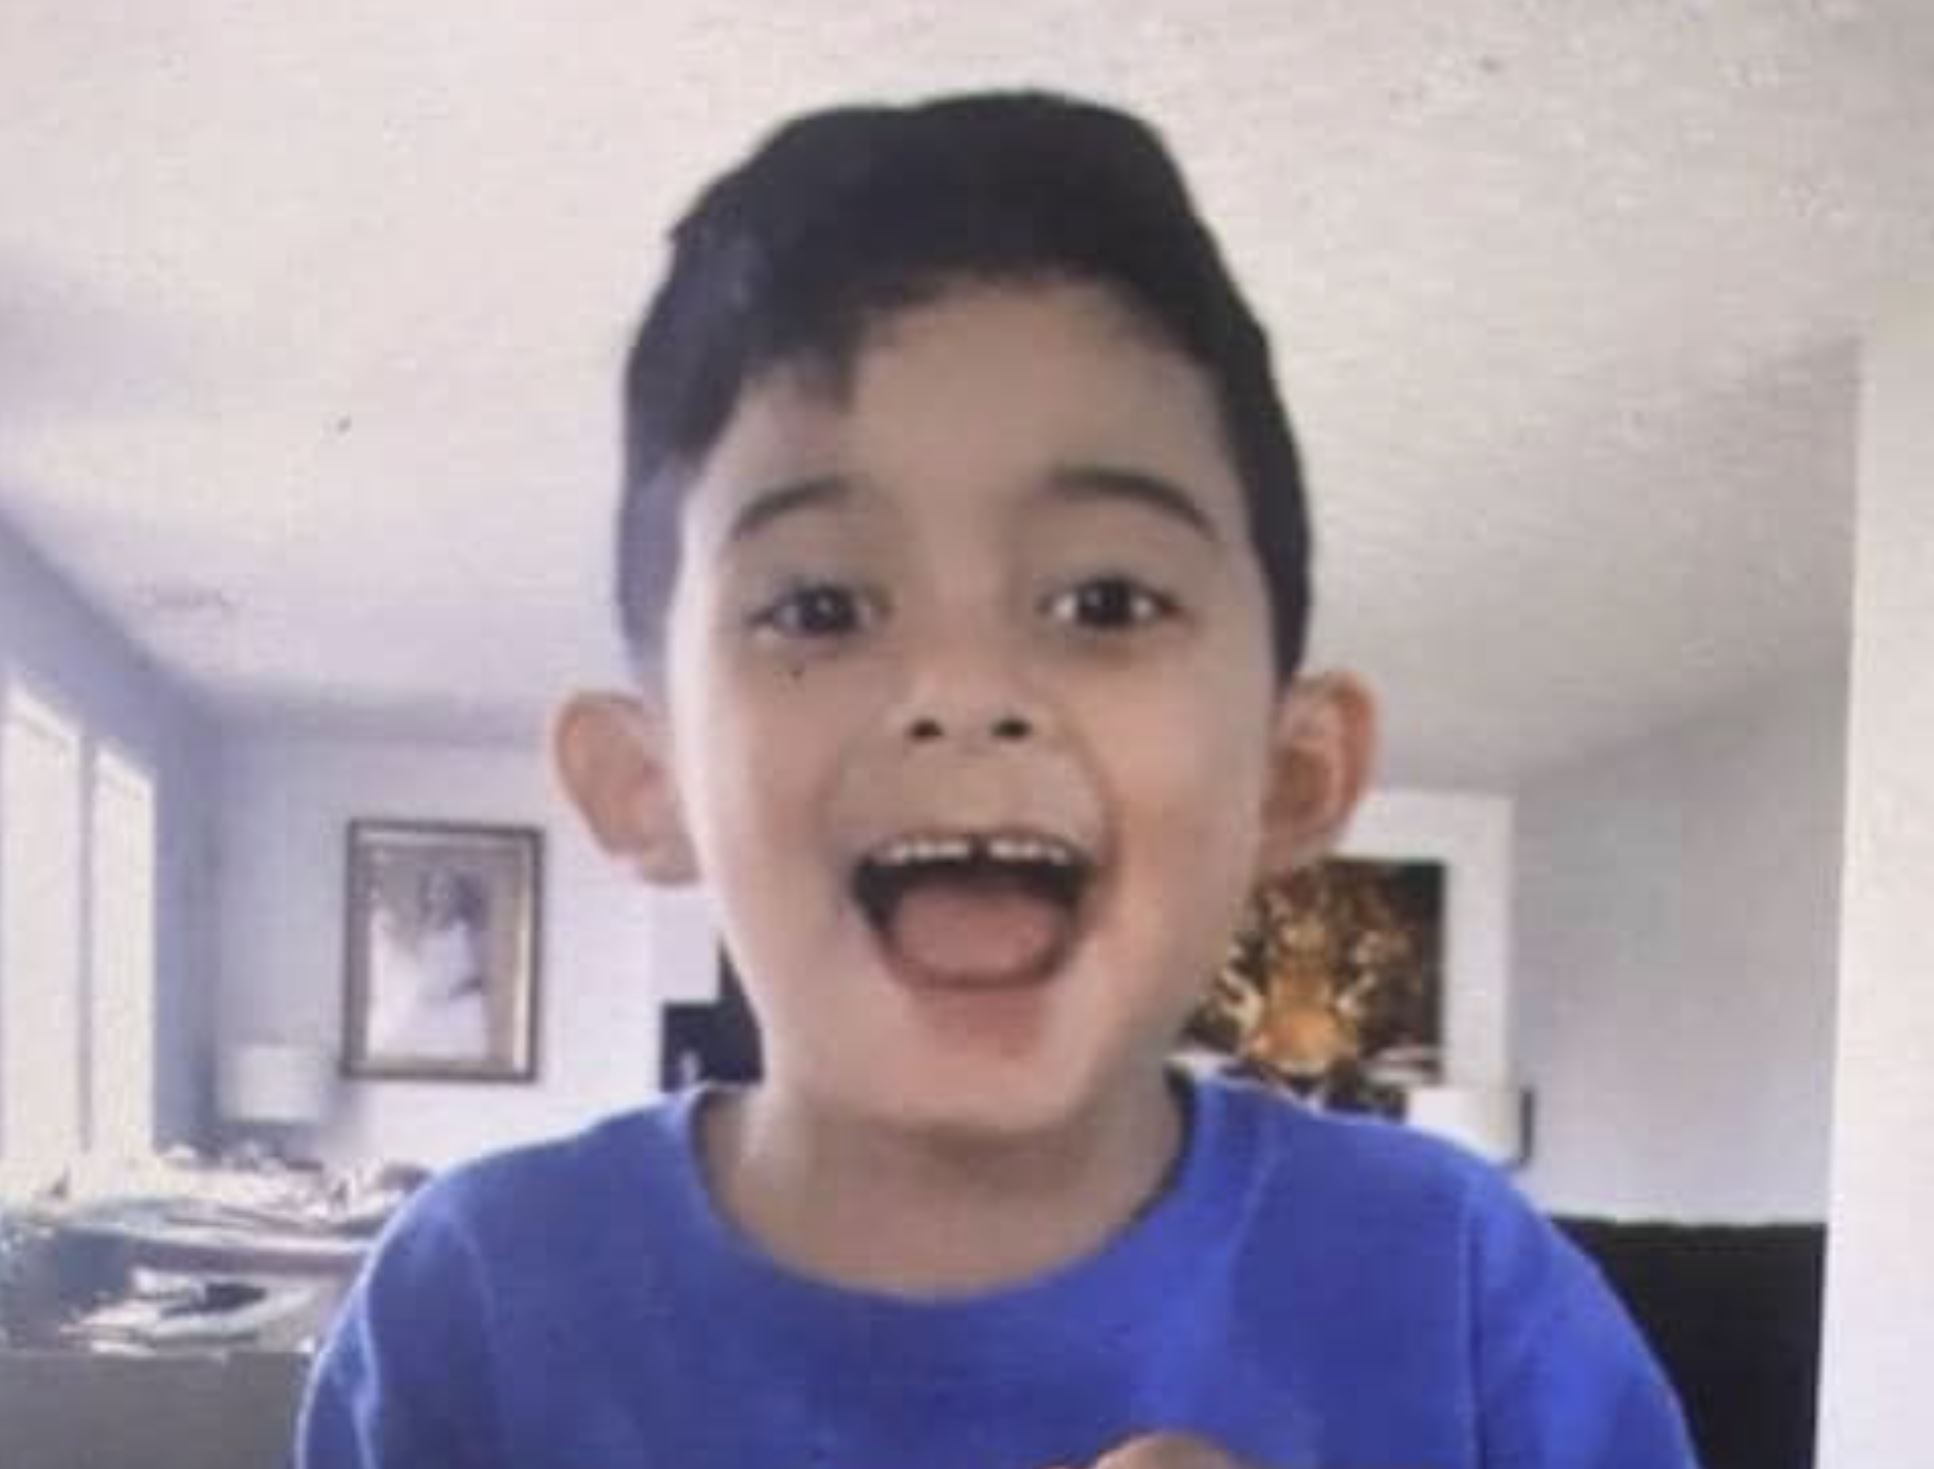 Three teenagers arrested in 6-year-old boys killing - CNN